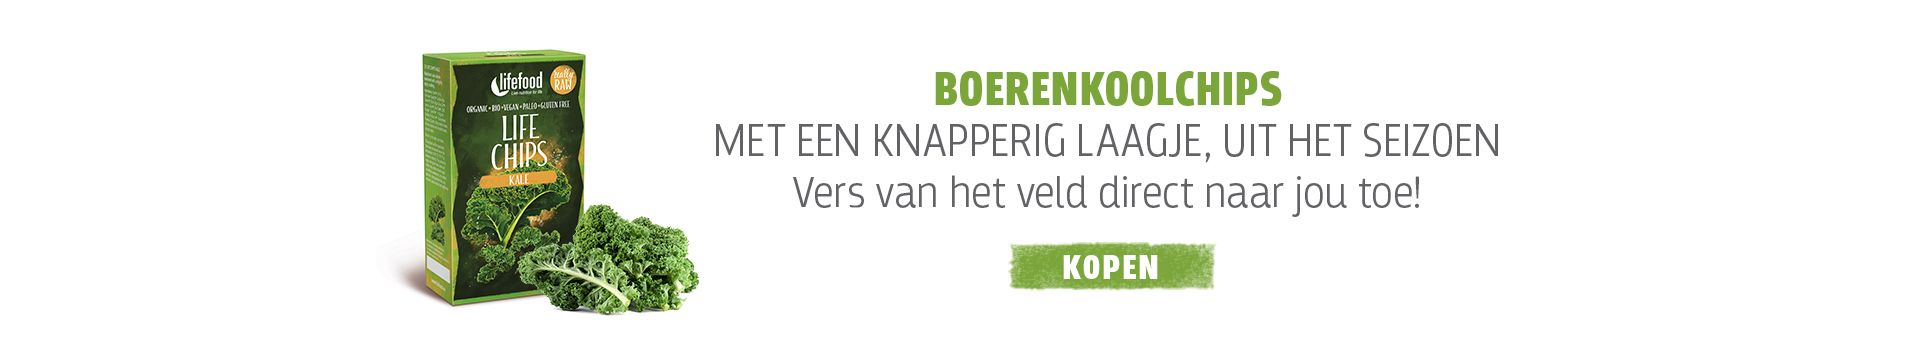 Groentechips Boerenkool